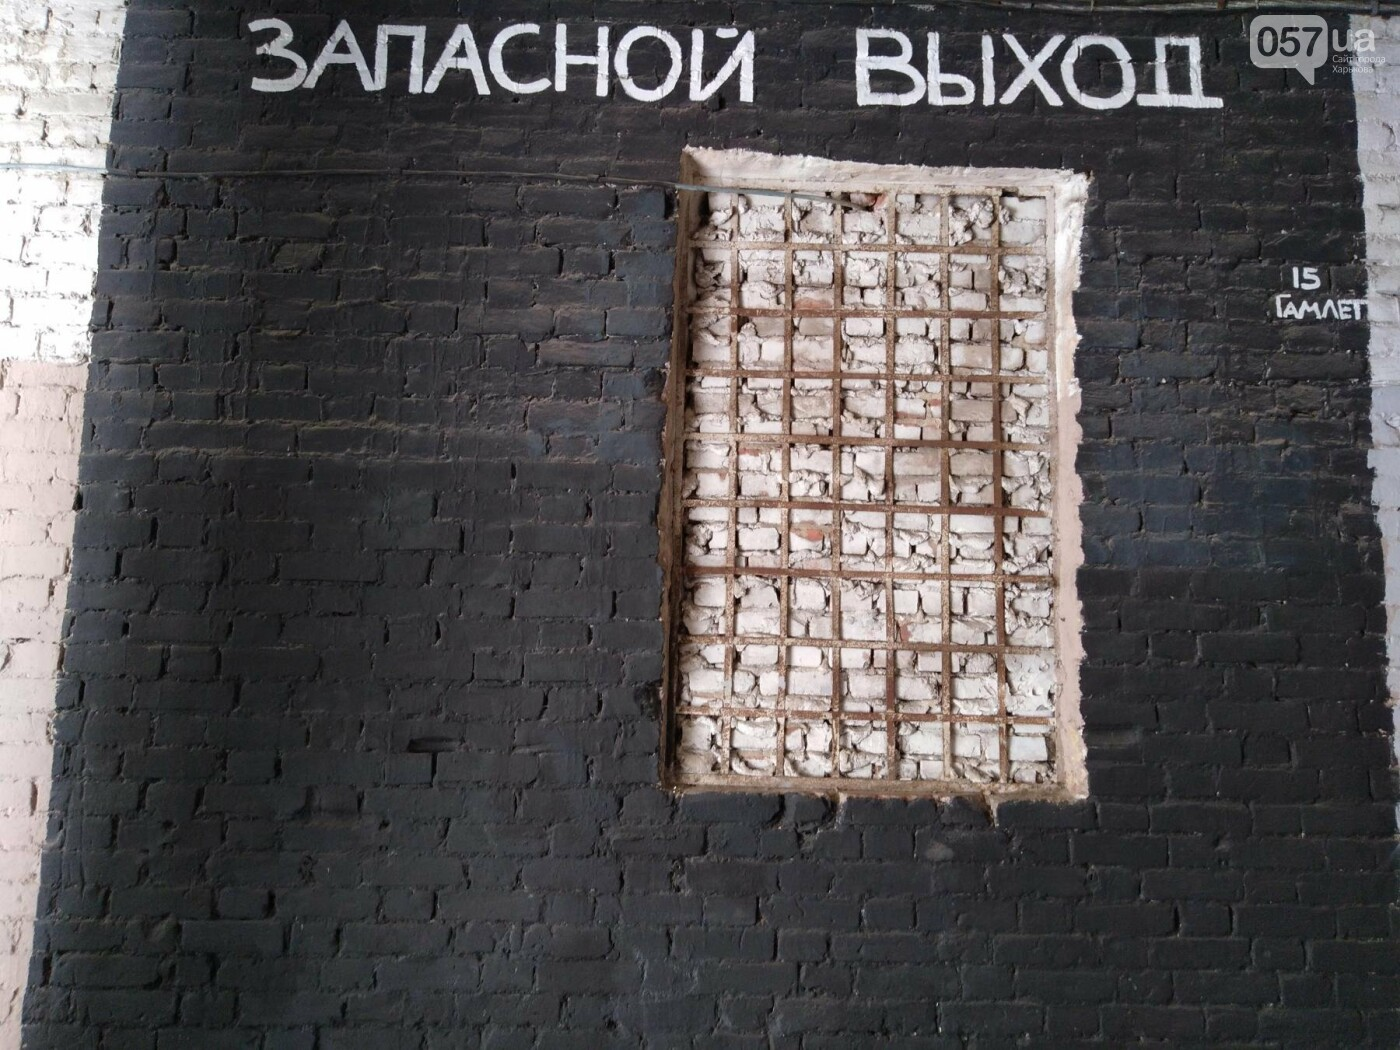 Стрит-арт Гамлета в Харькове: ТОП-10 граффити художника, - ФОТО, фото-19